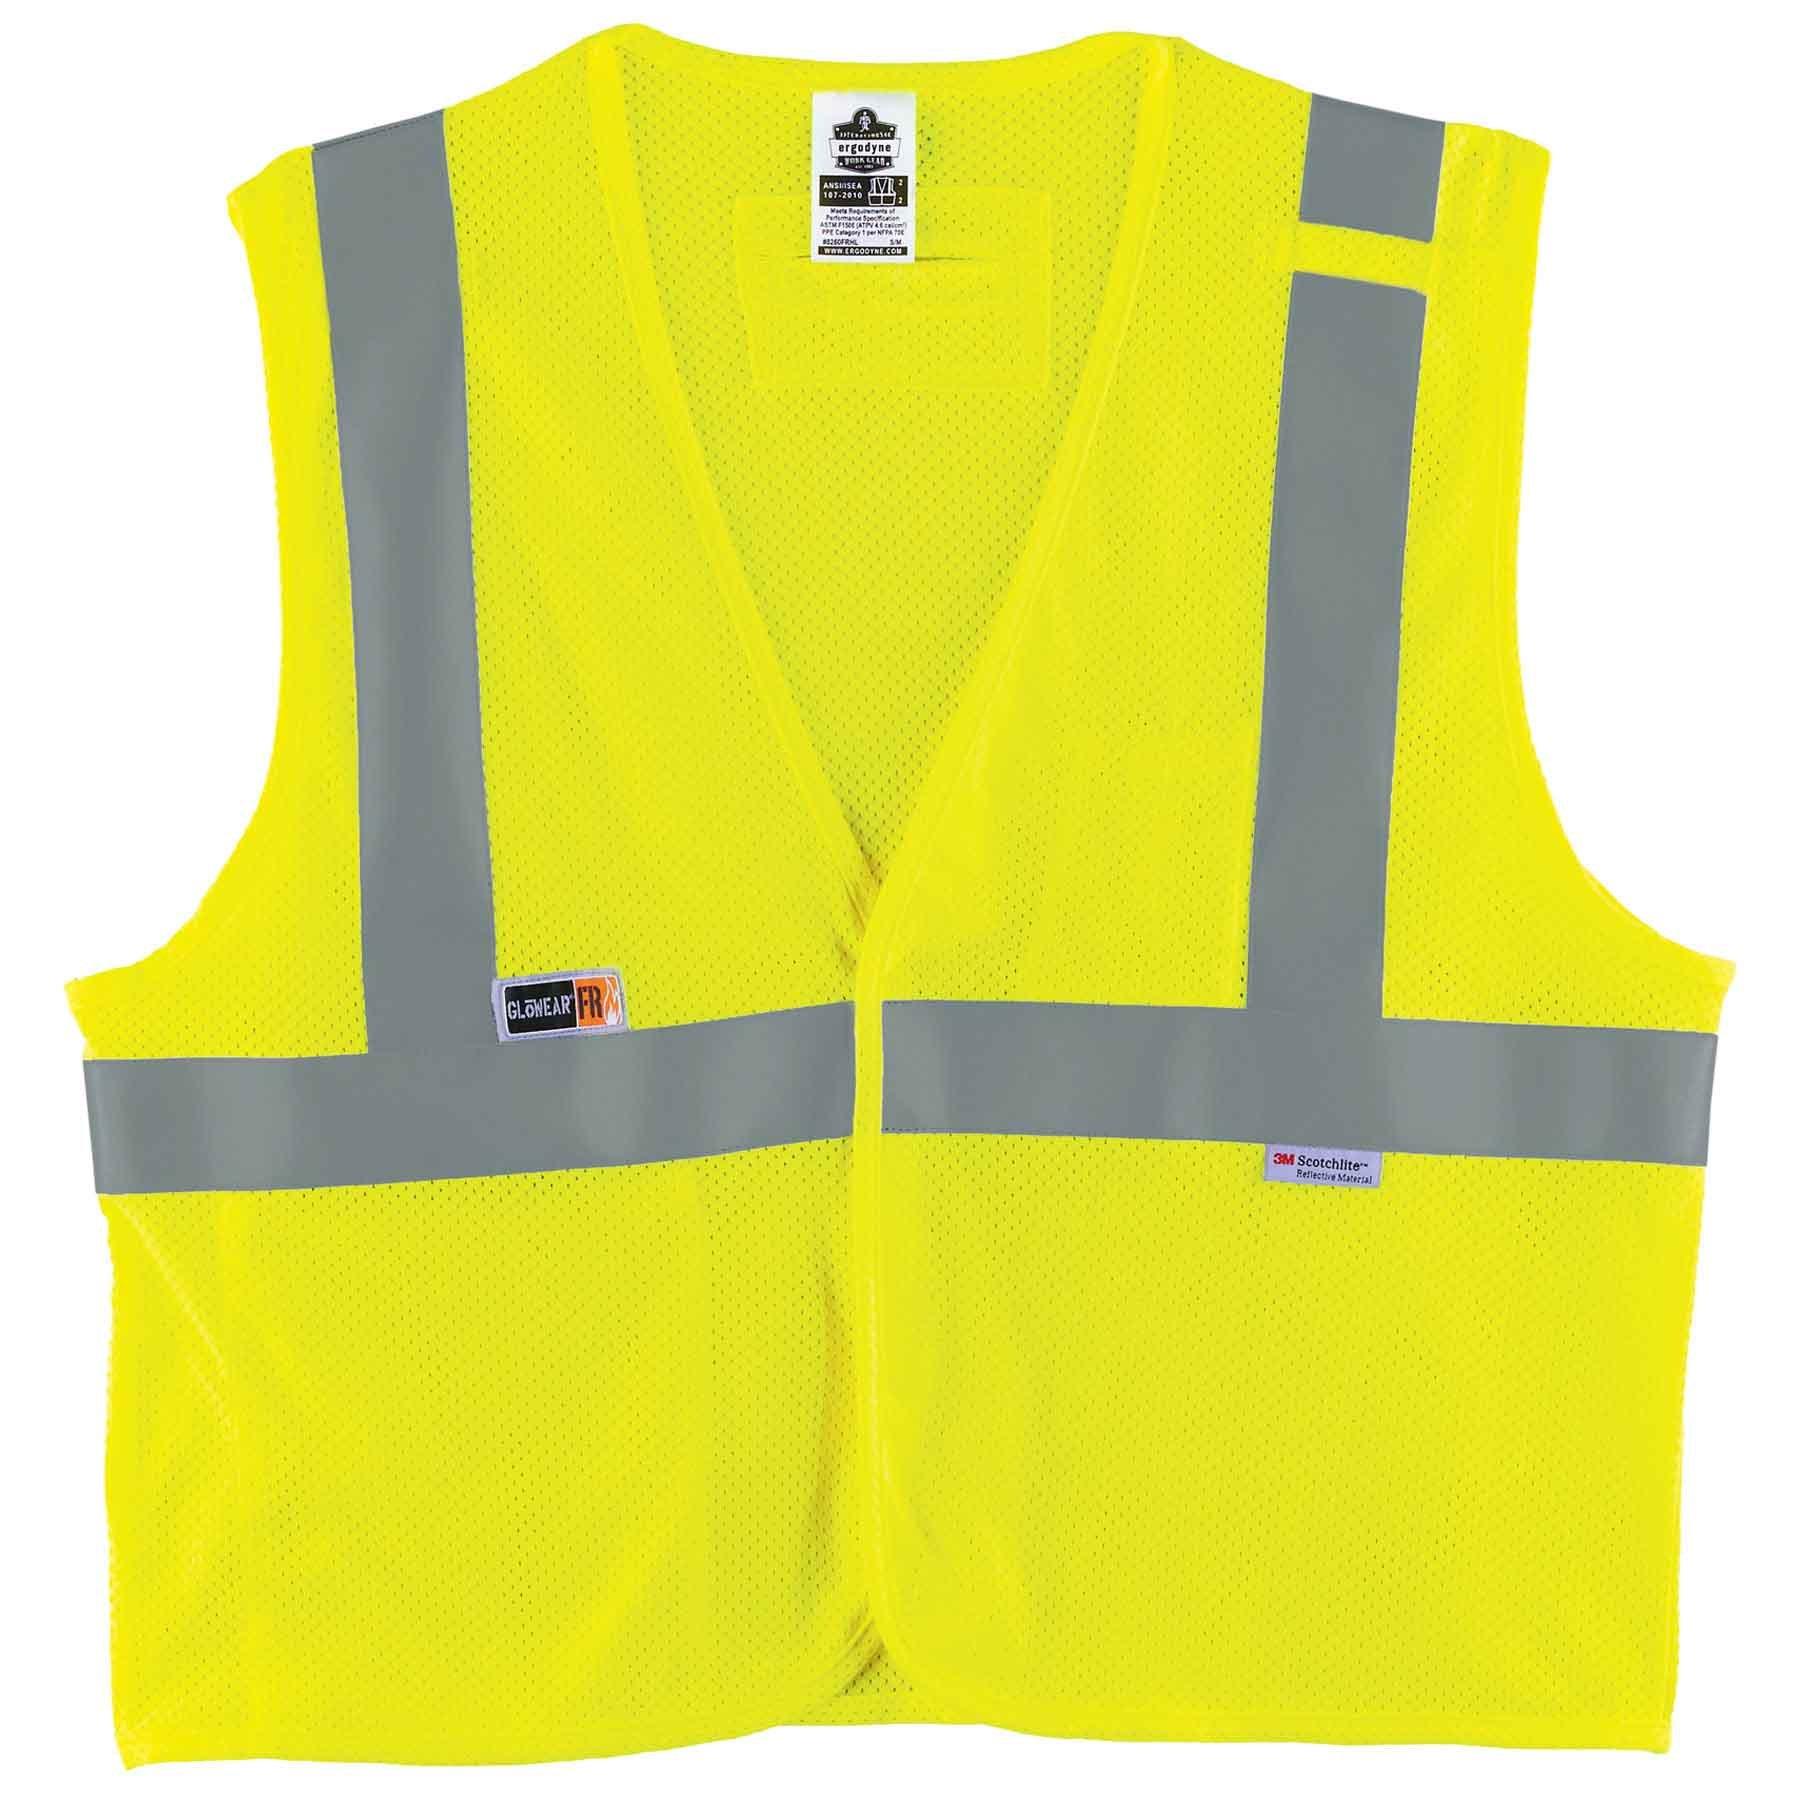 Ergodyne GloWear 8260FRHL ANSI Flame Resistant Modacrylic Lime Reflective Safety Vest, Large/X-Large